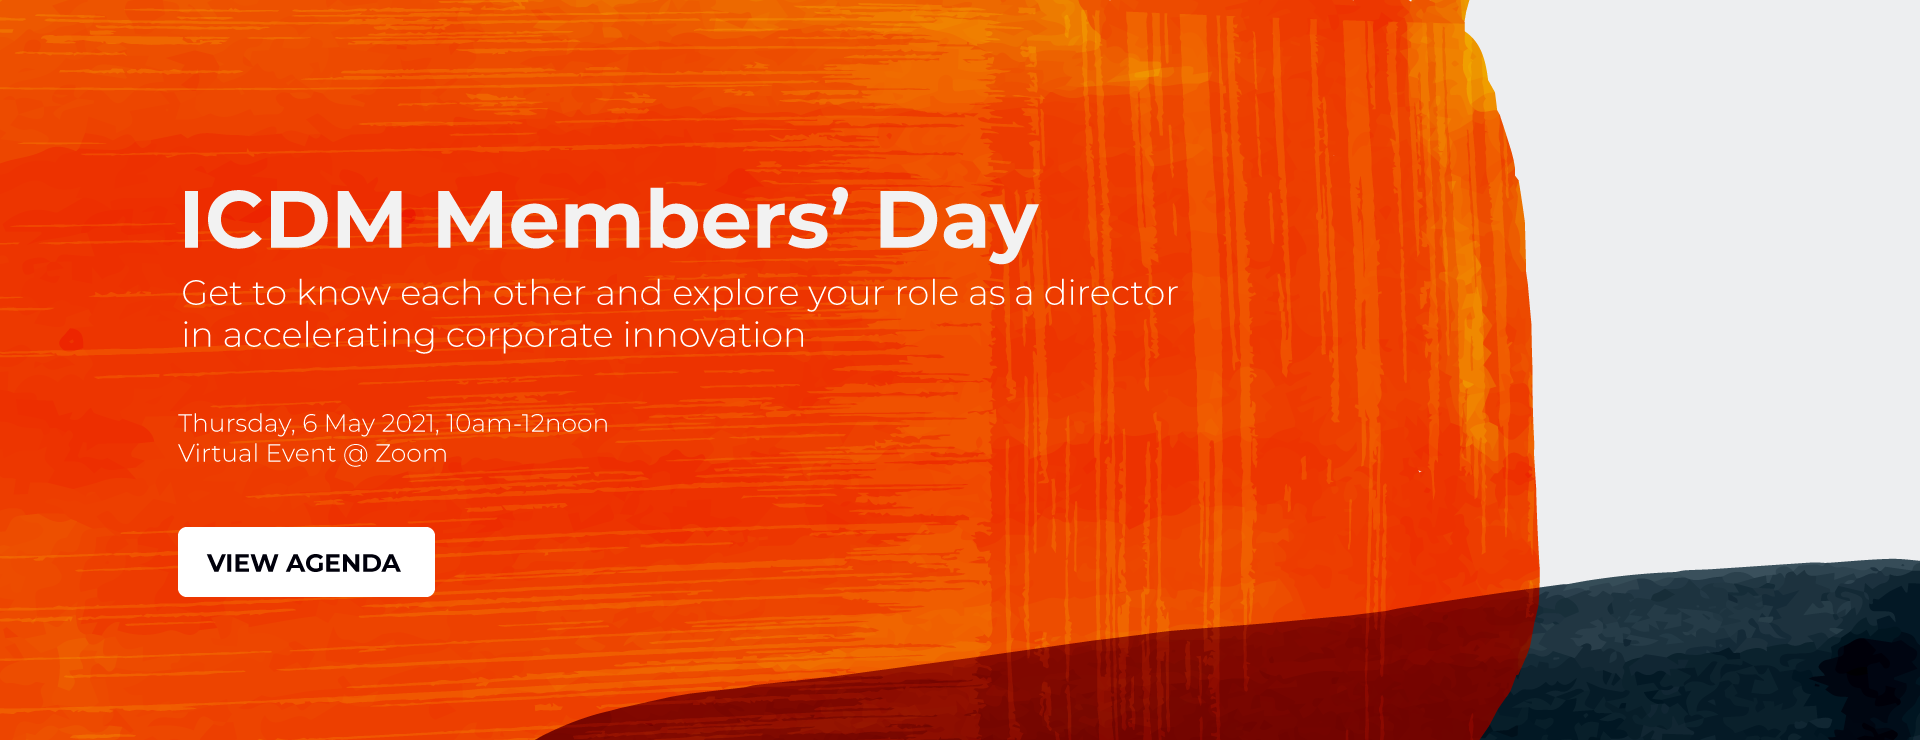 ICDM Member's Day 2021